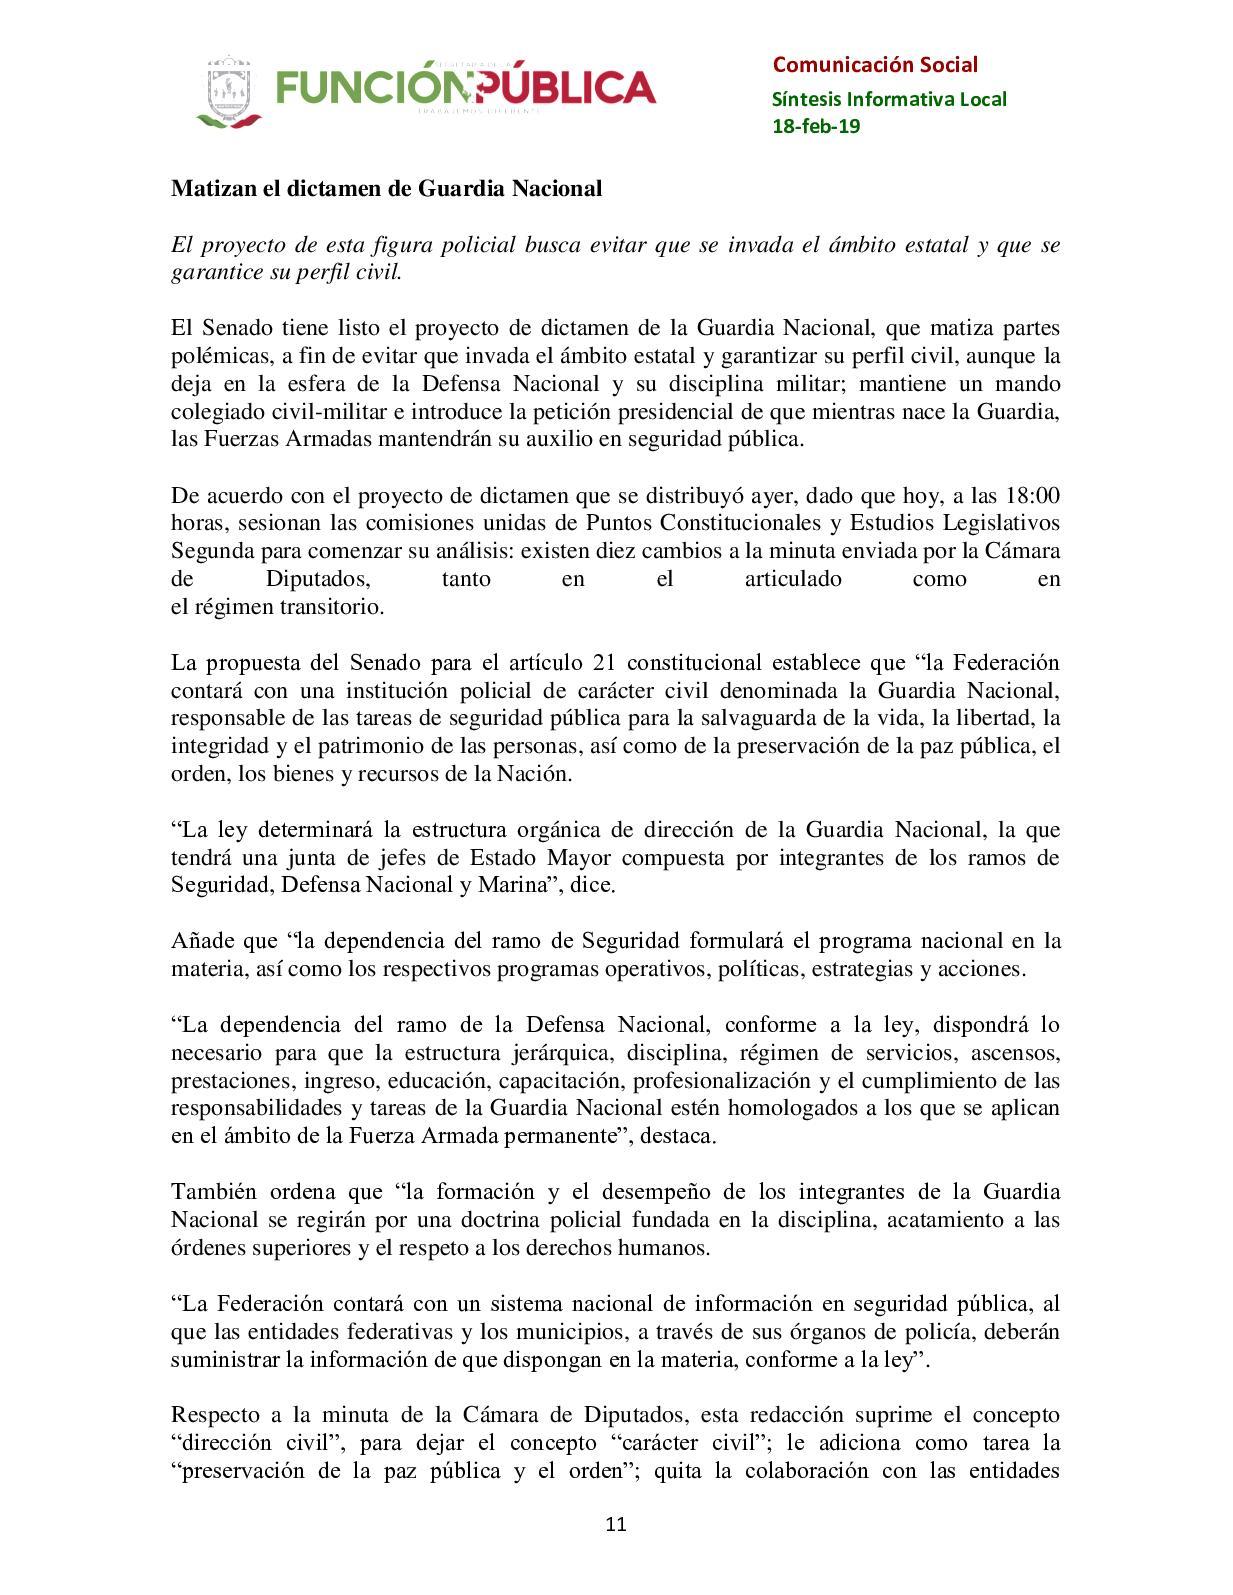 Síntesis Local Nacional De Comunicación Social De La Sfp 18